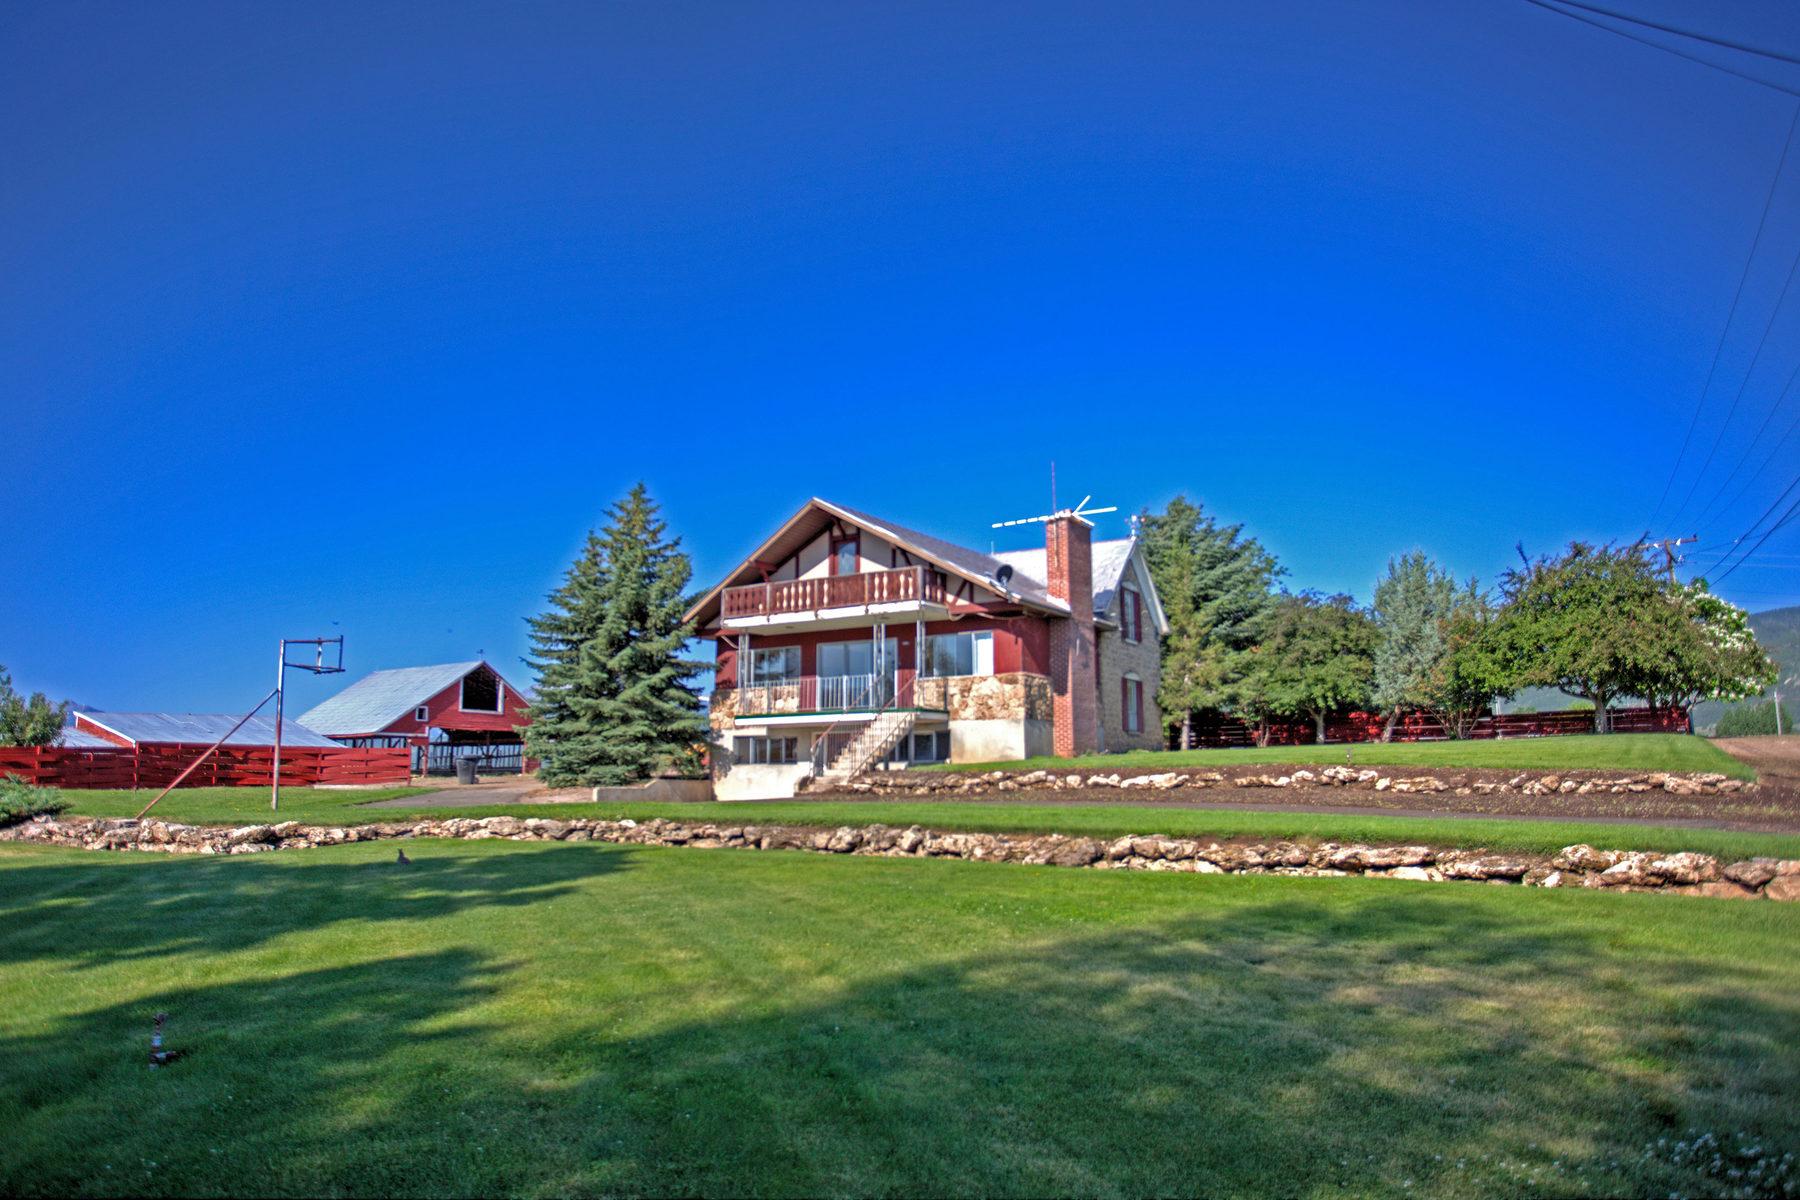 Moradia para Venda às One of a Kind Midway Property 380 E 600 N Midway, Utah 84049 Estados Unidos